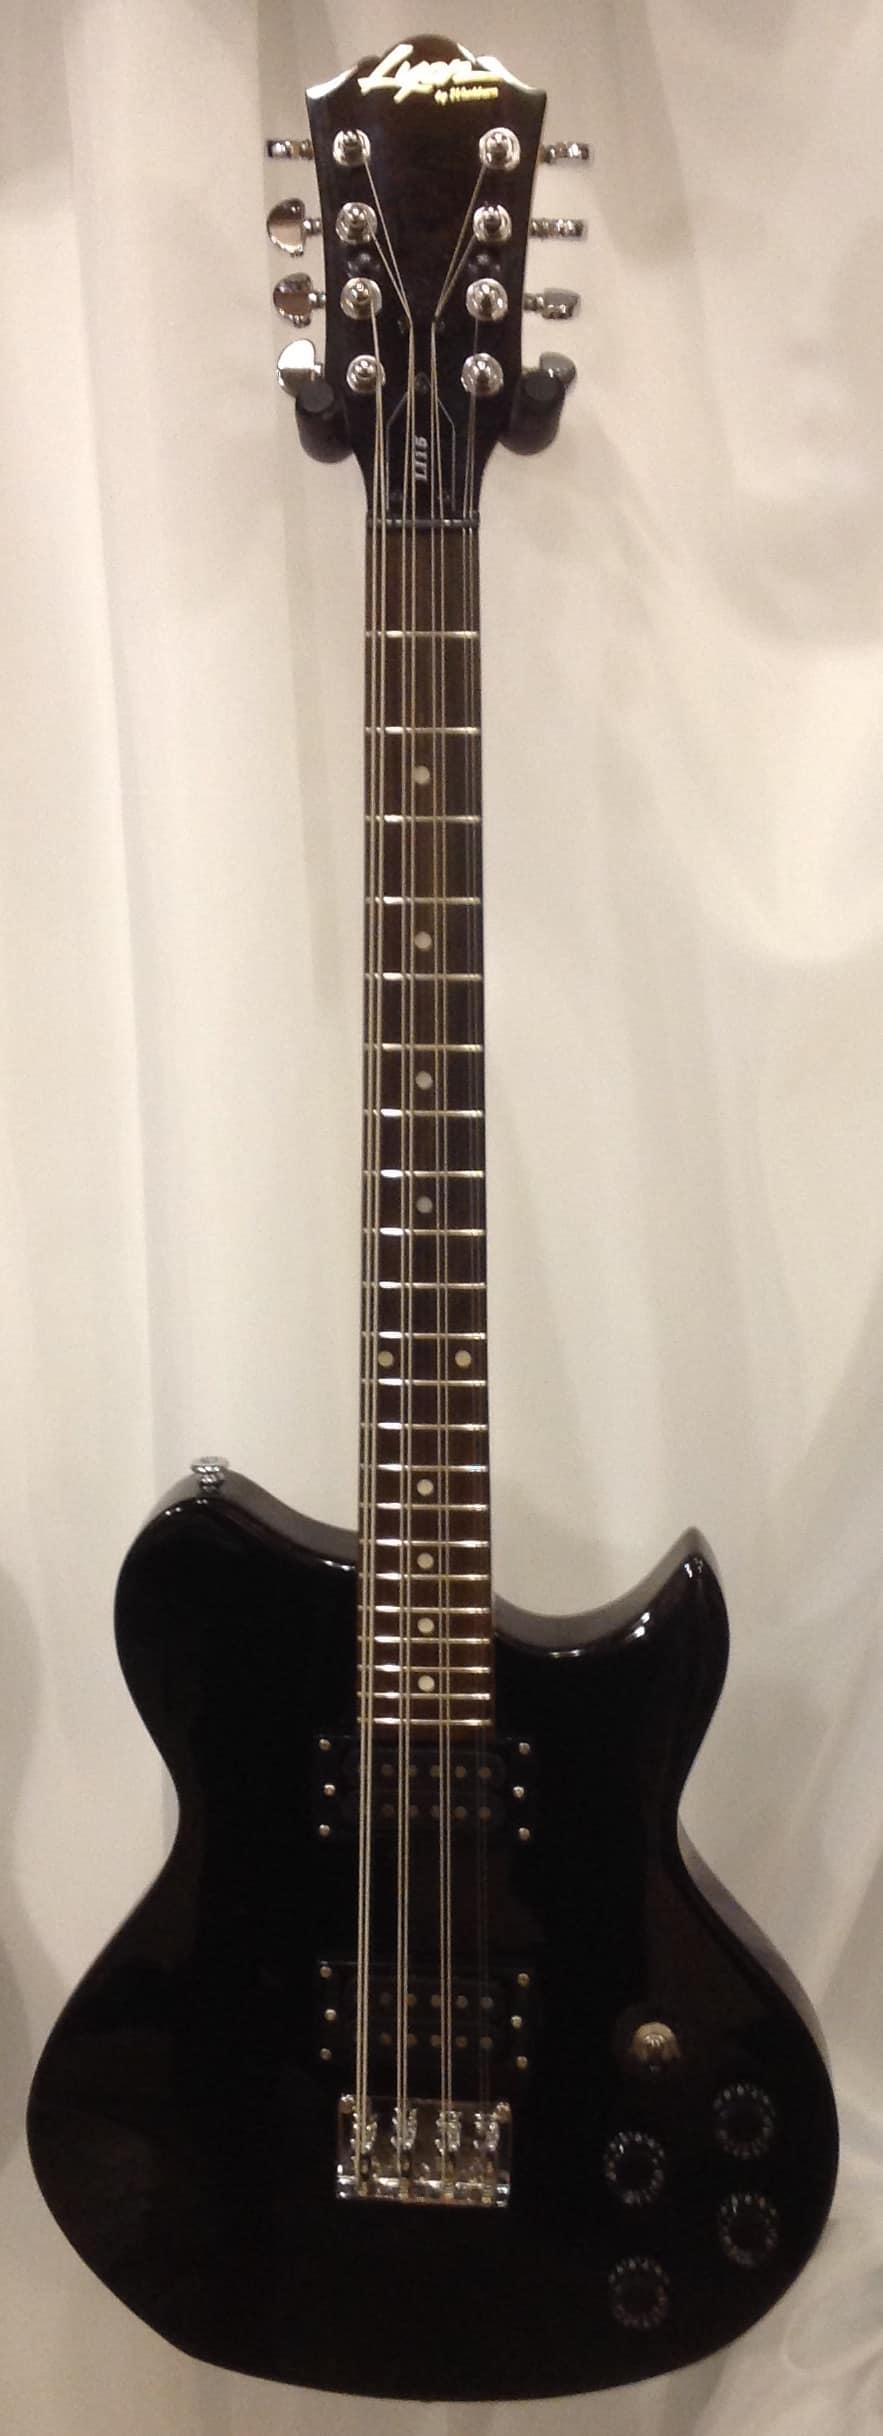 mortone lyon washburn electric mandocello octave reverb. Black Bedroom Furniture Sets. Home Design Ideas